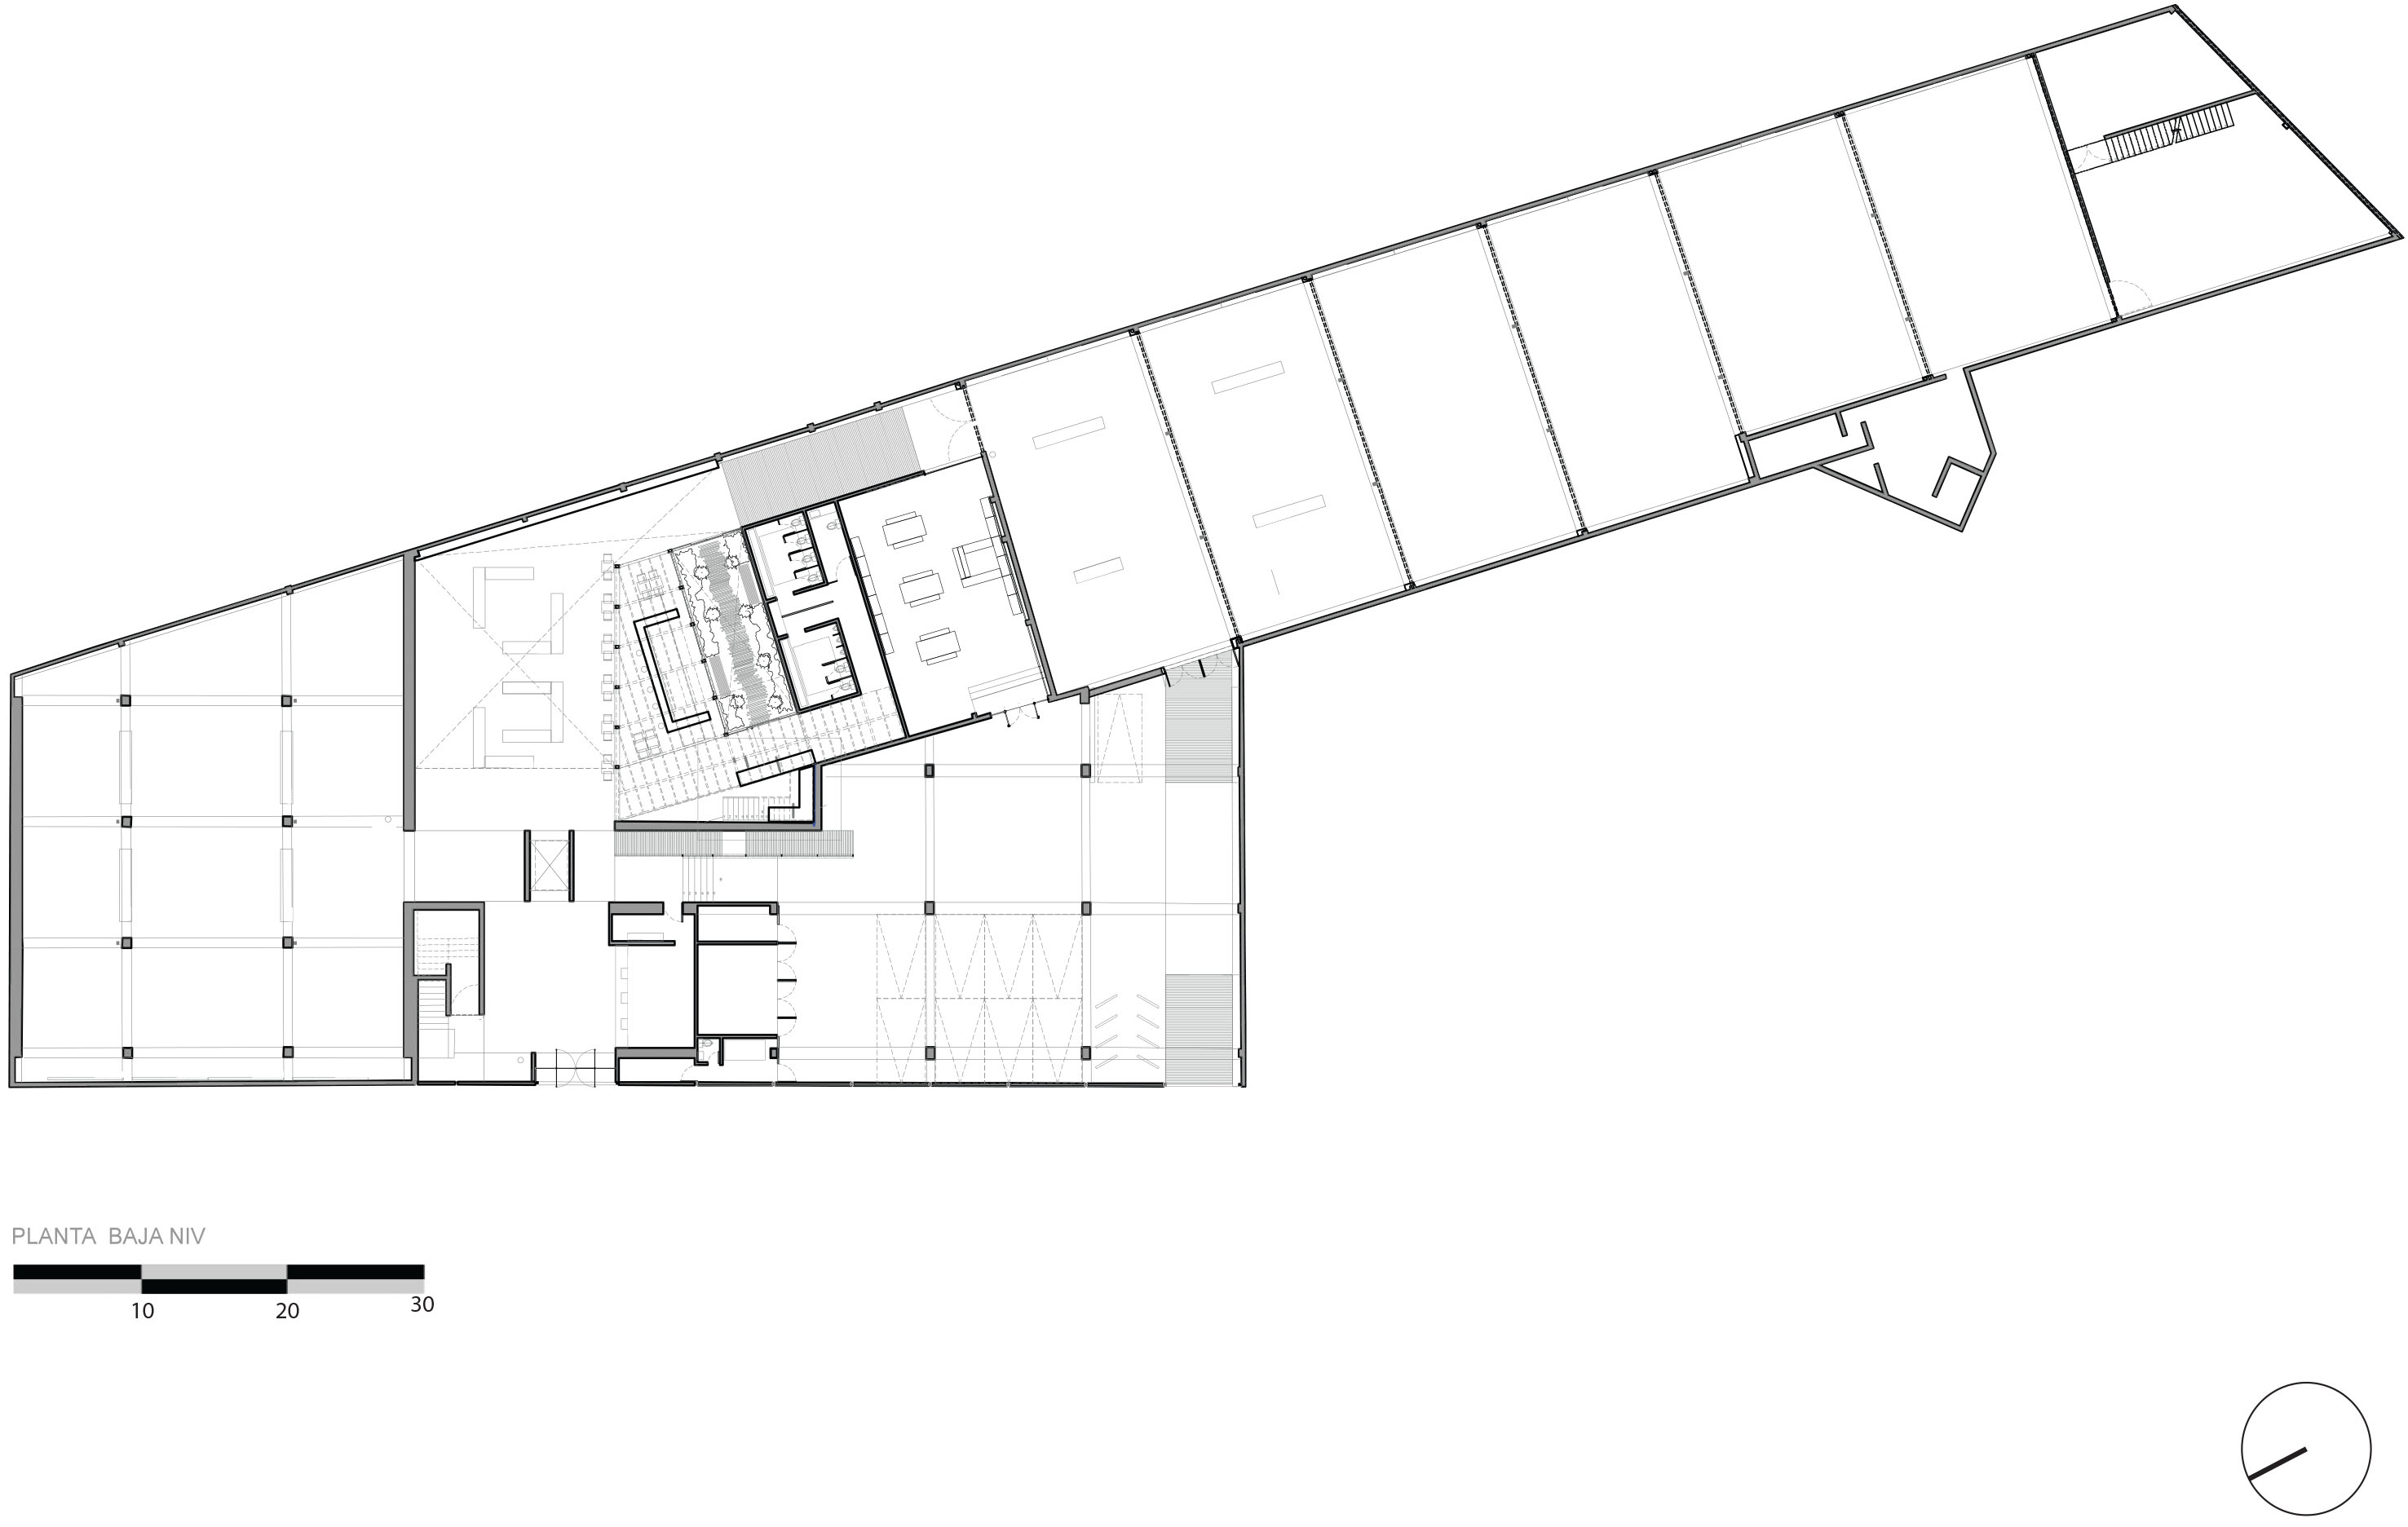 Fotomuseo cuatro caminos arquine for Ejes arquitectonicos